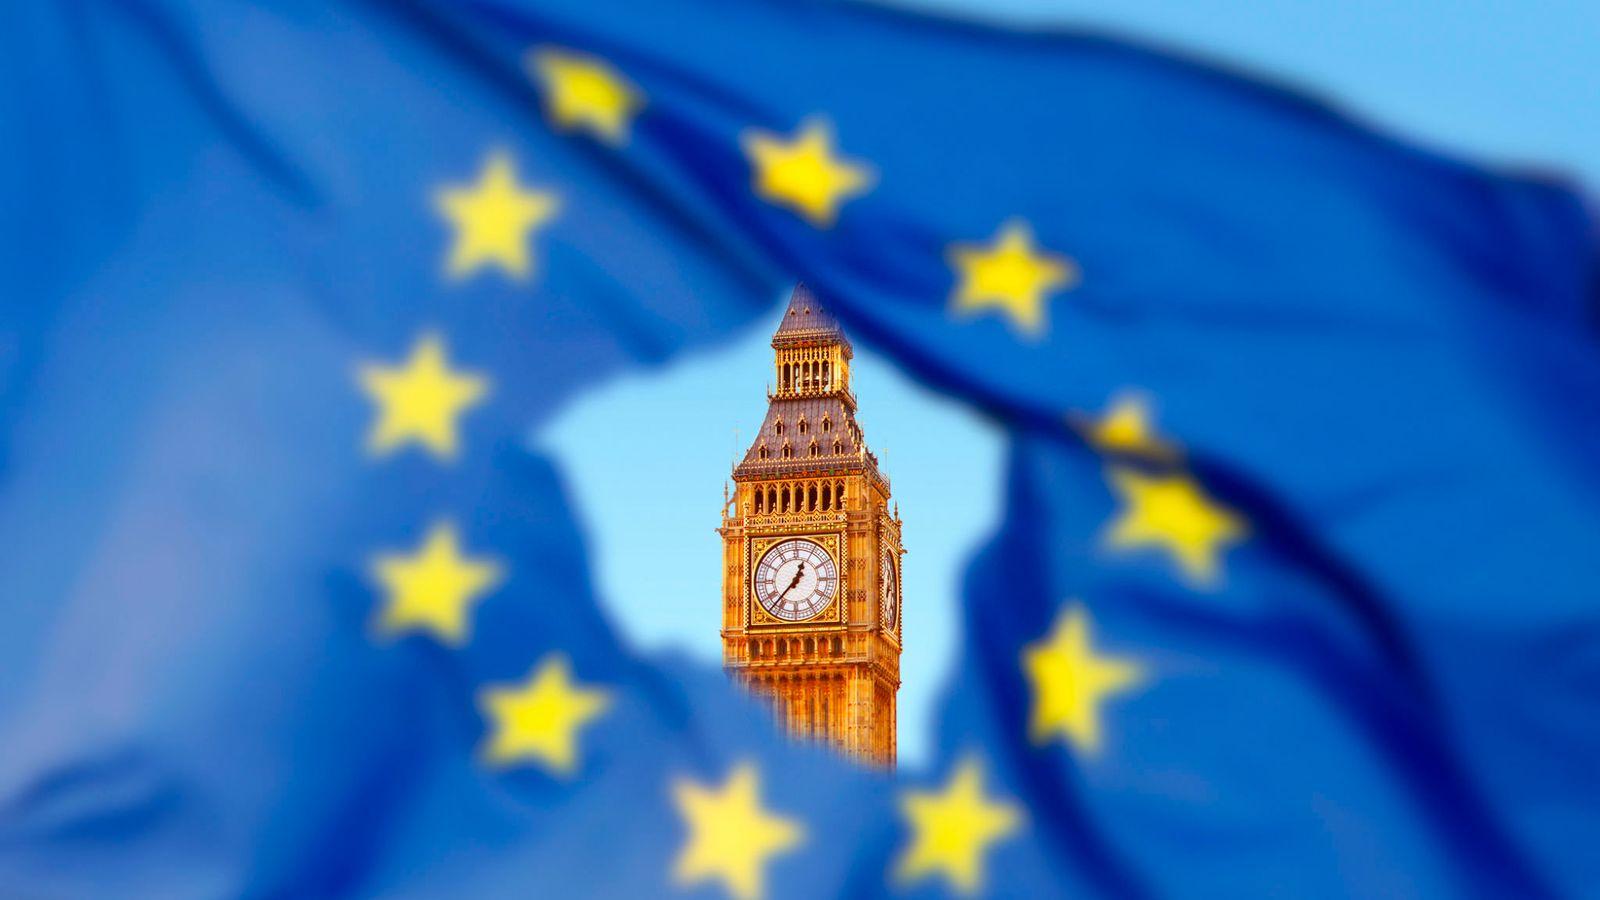 Brexit Schmexit Eu Flag Westminster